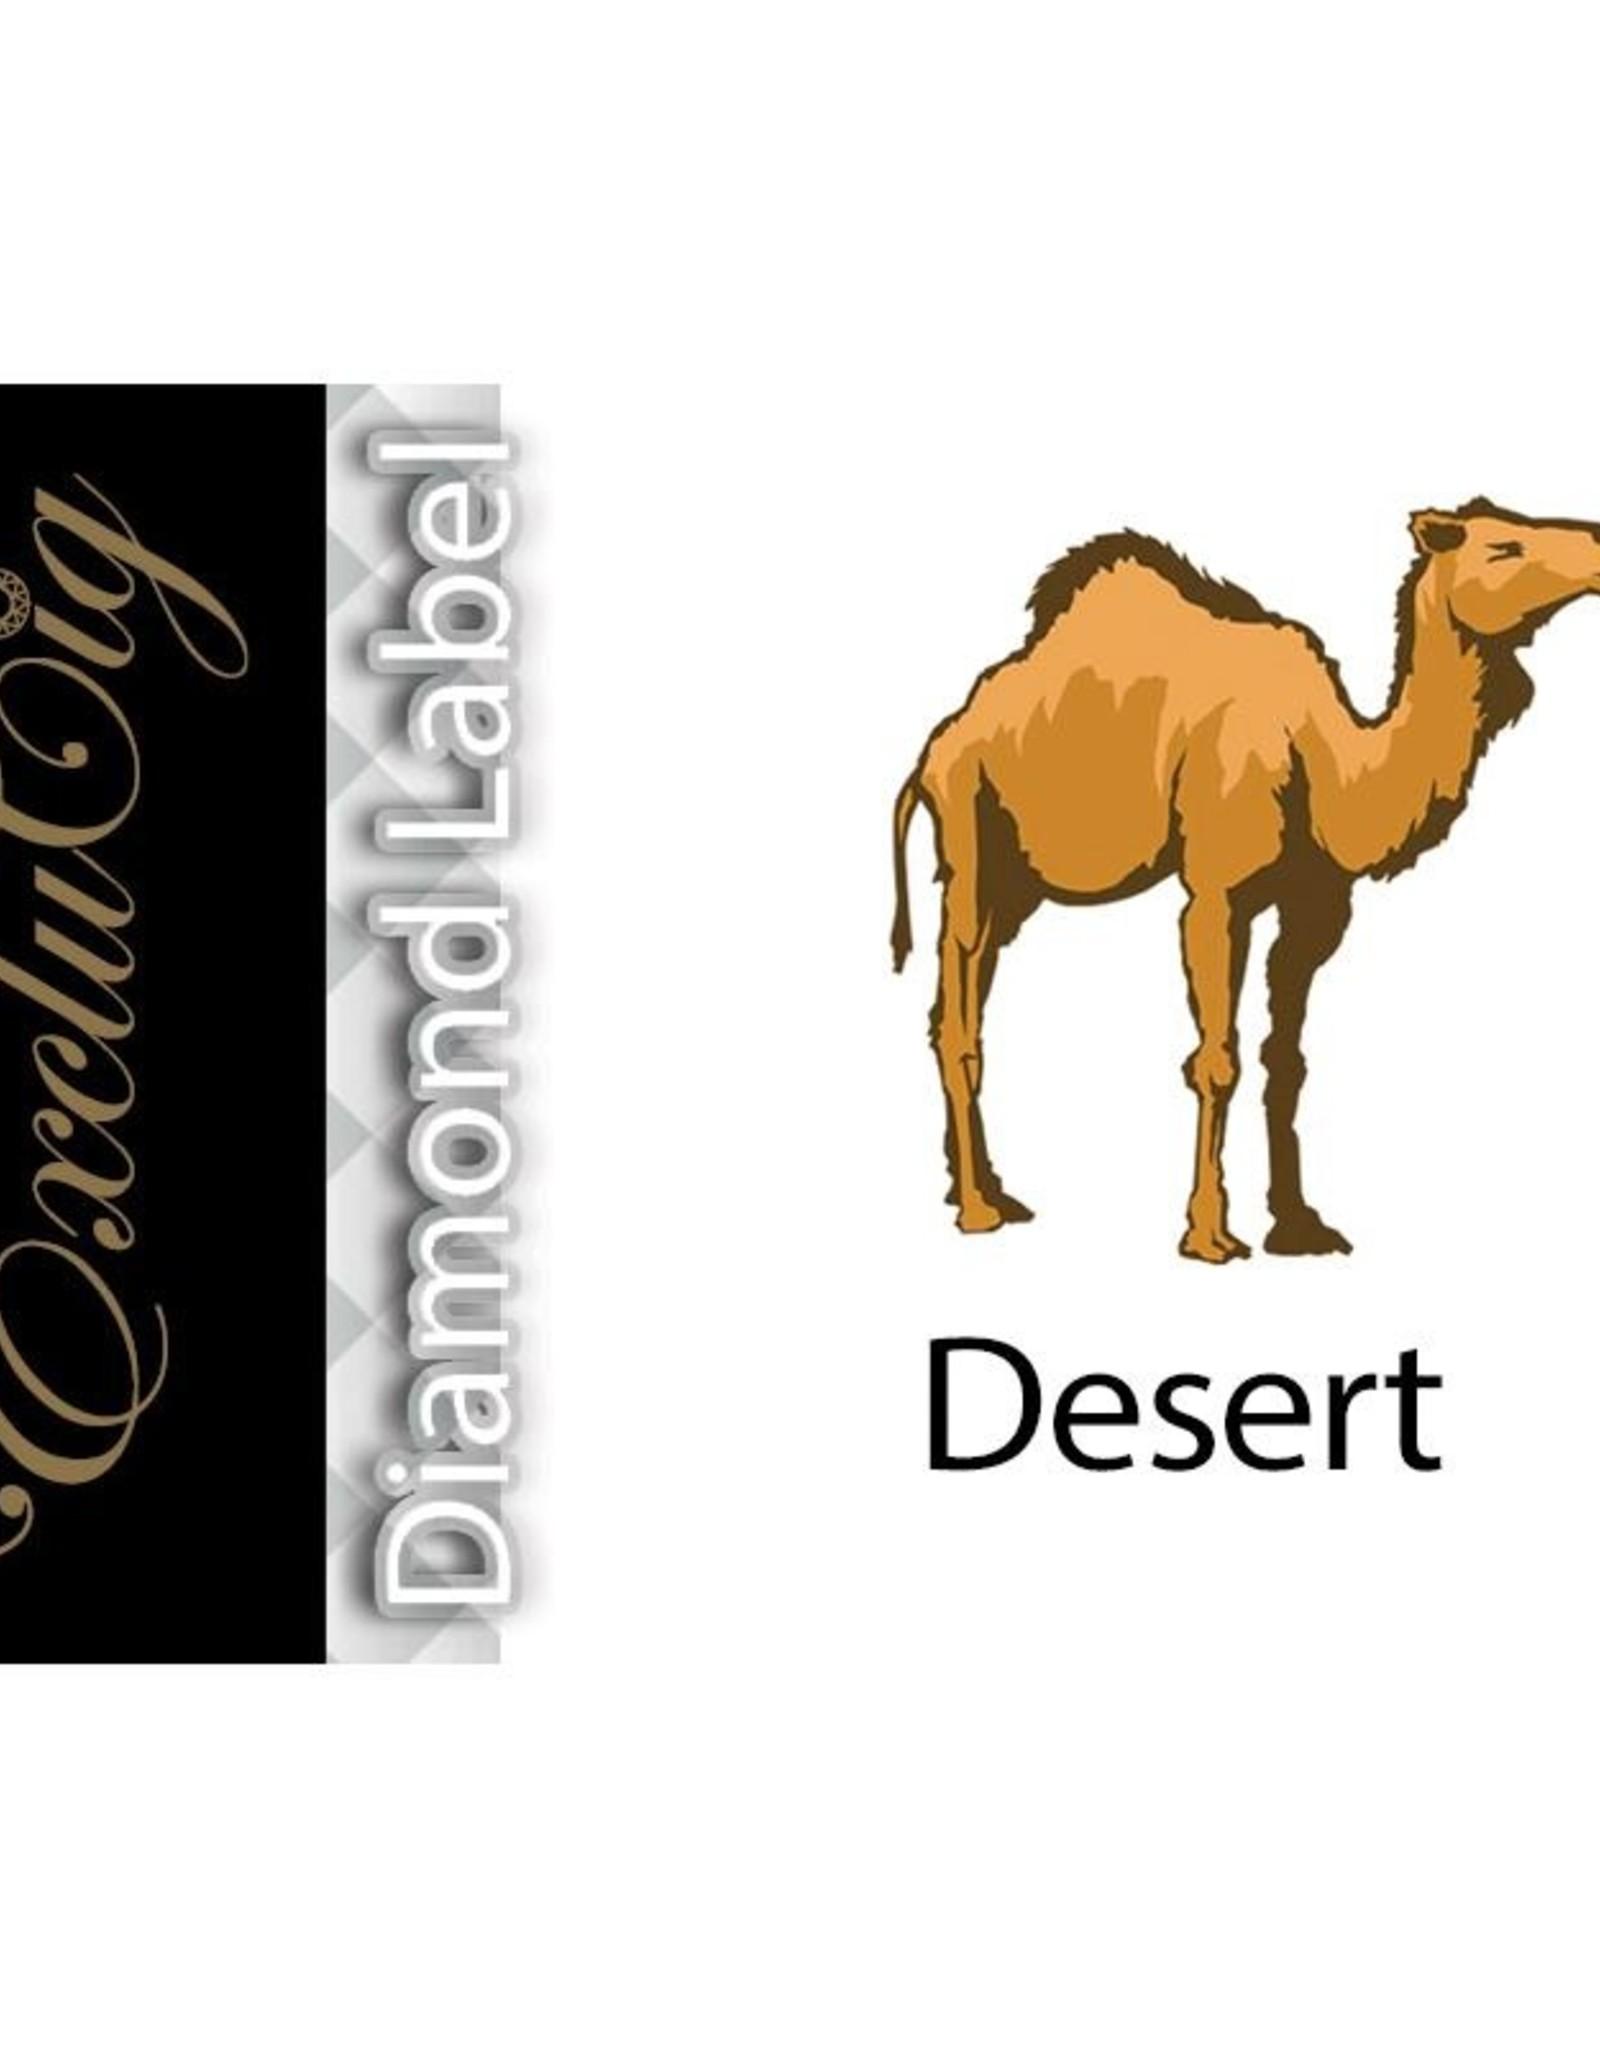 Exclucig Exclucig Diamond Label E-liquid Desert 3 mg Nicotine